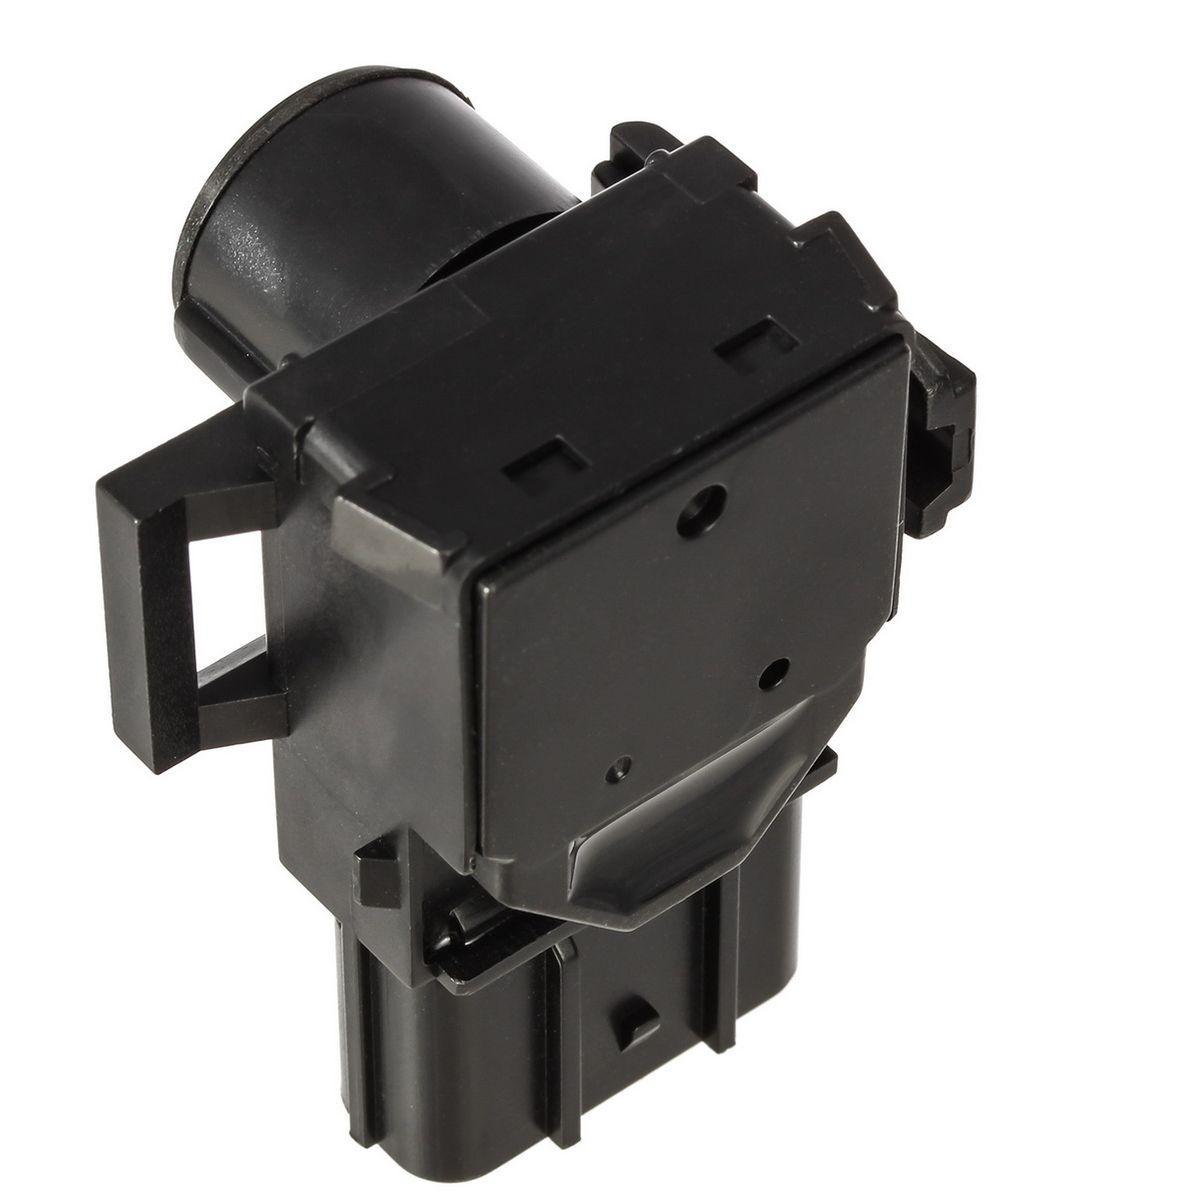 39680-TL0-G01 PDC Parking Sensor For 2012-15 Honda Pilot 08-12 Accord 09 Insight